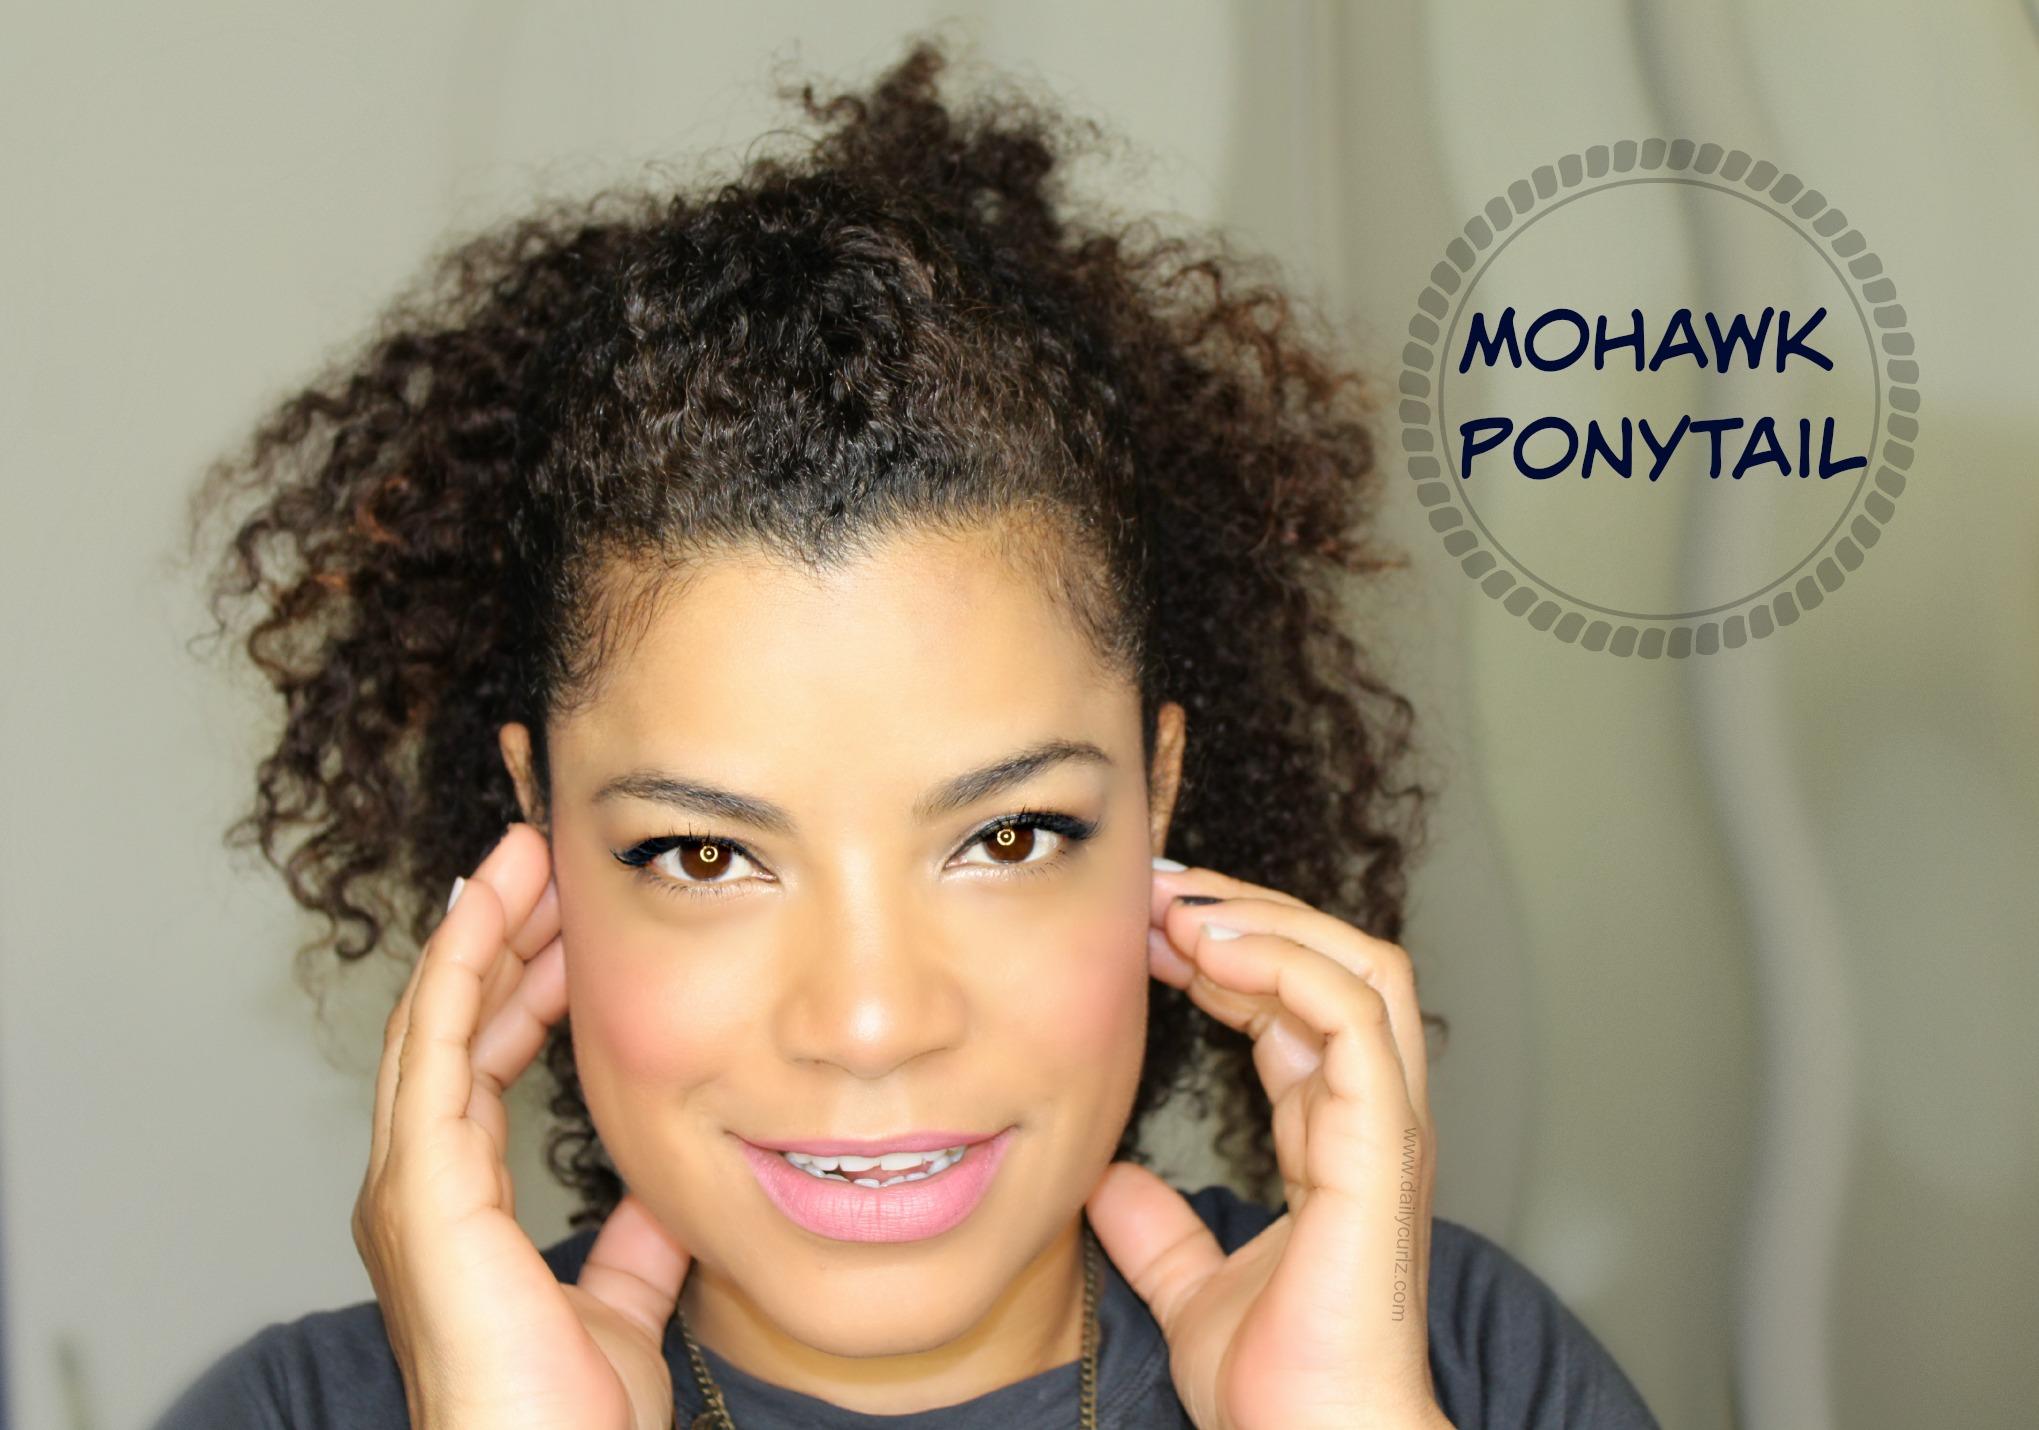 Easy fuller ponytail | Cola de caballo en el cabello rizado